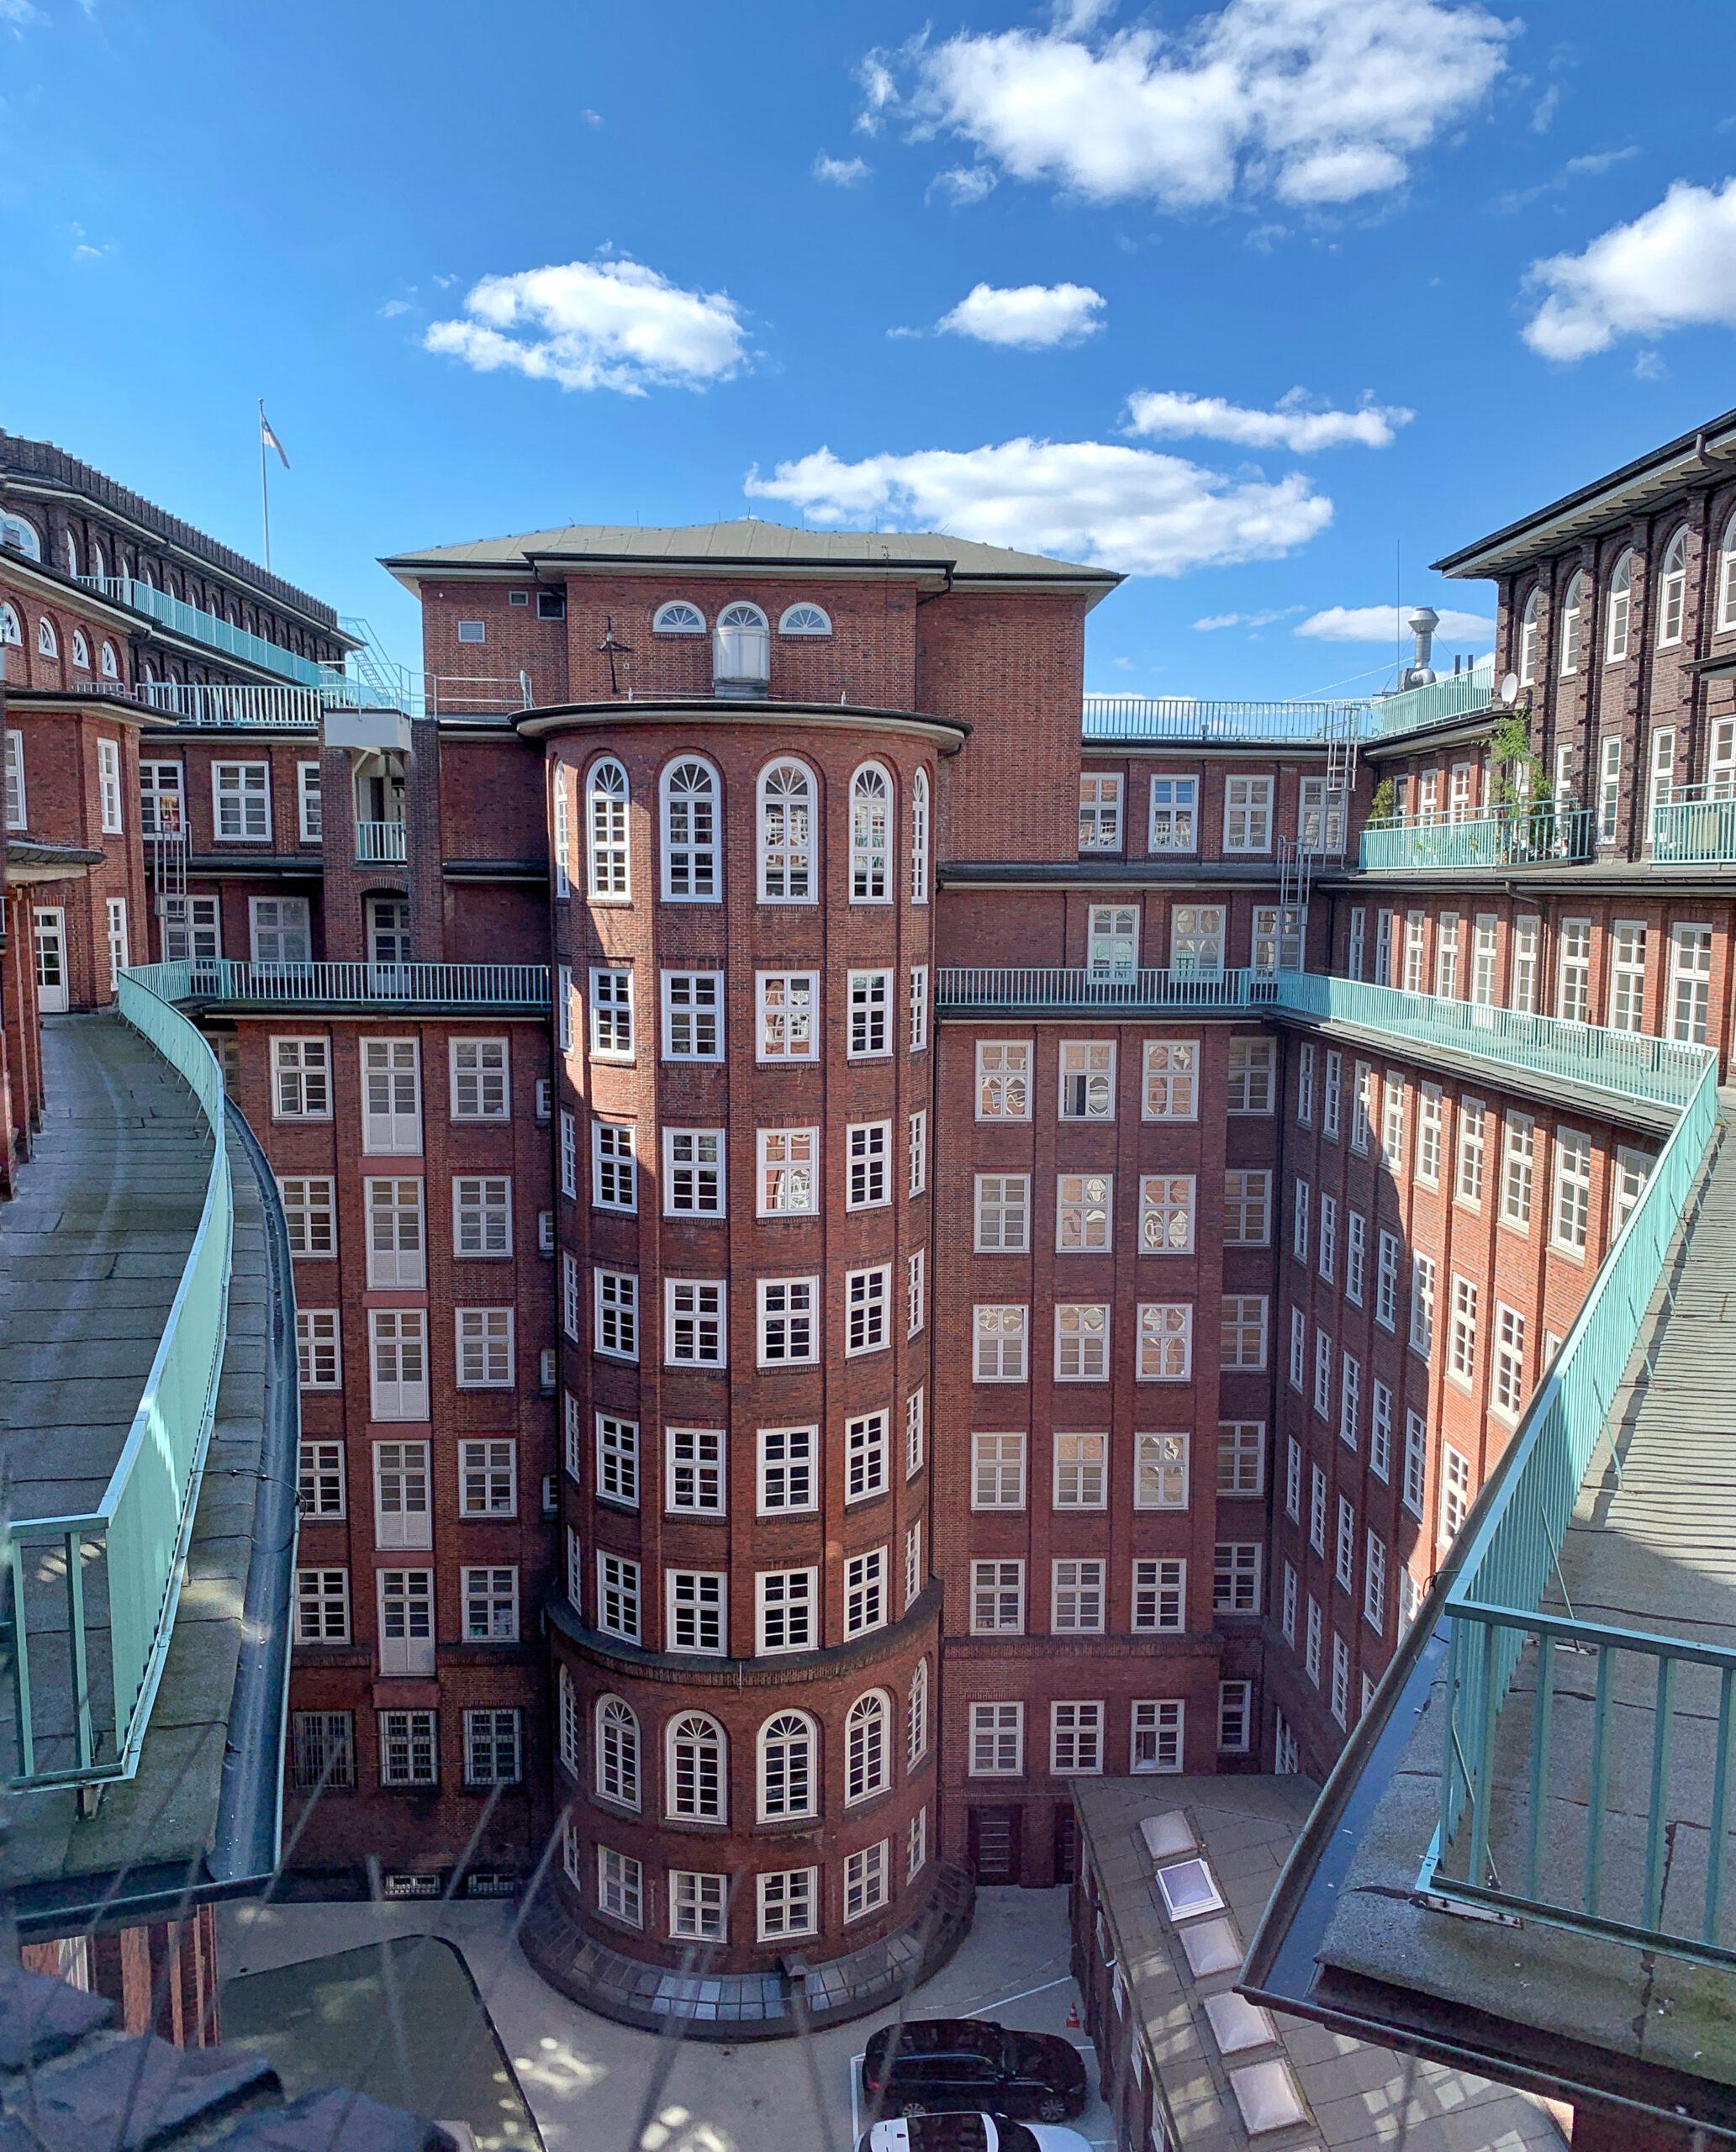 Hinterhöfe in Hamburg: Blick in den Innenhof des Chilehauses